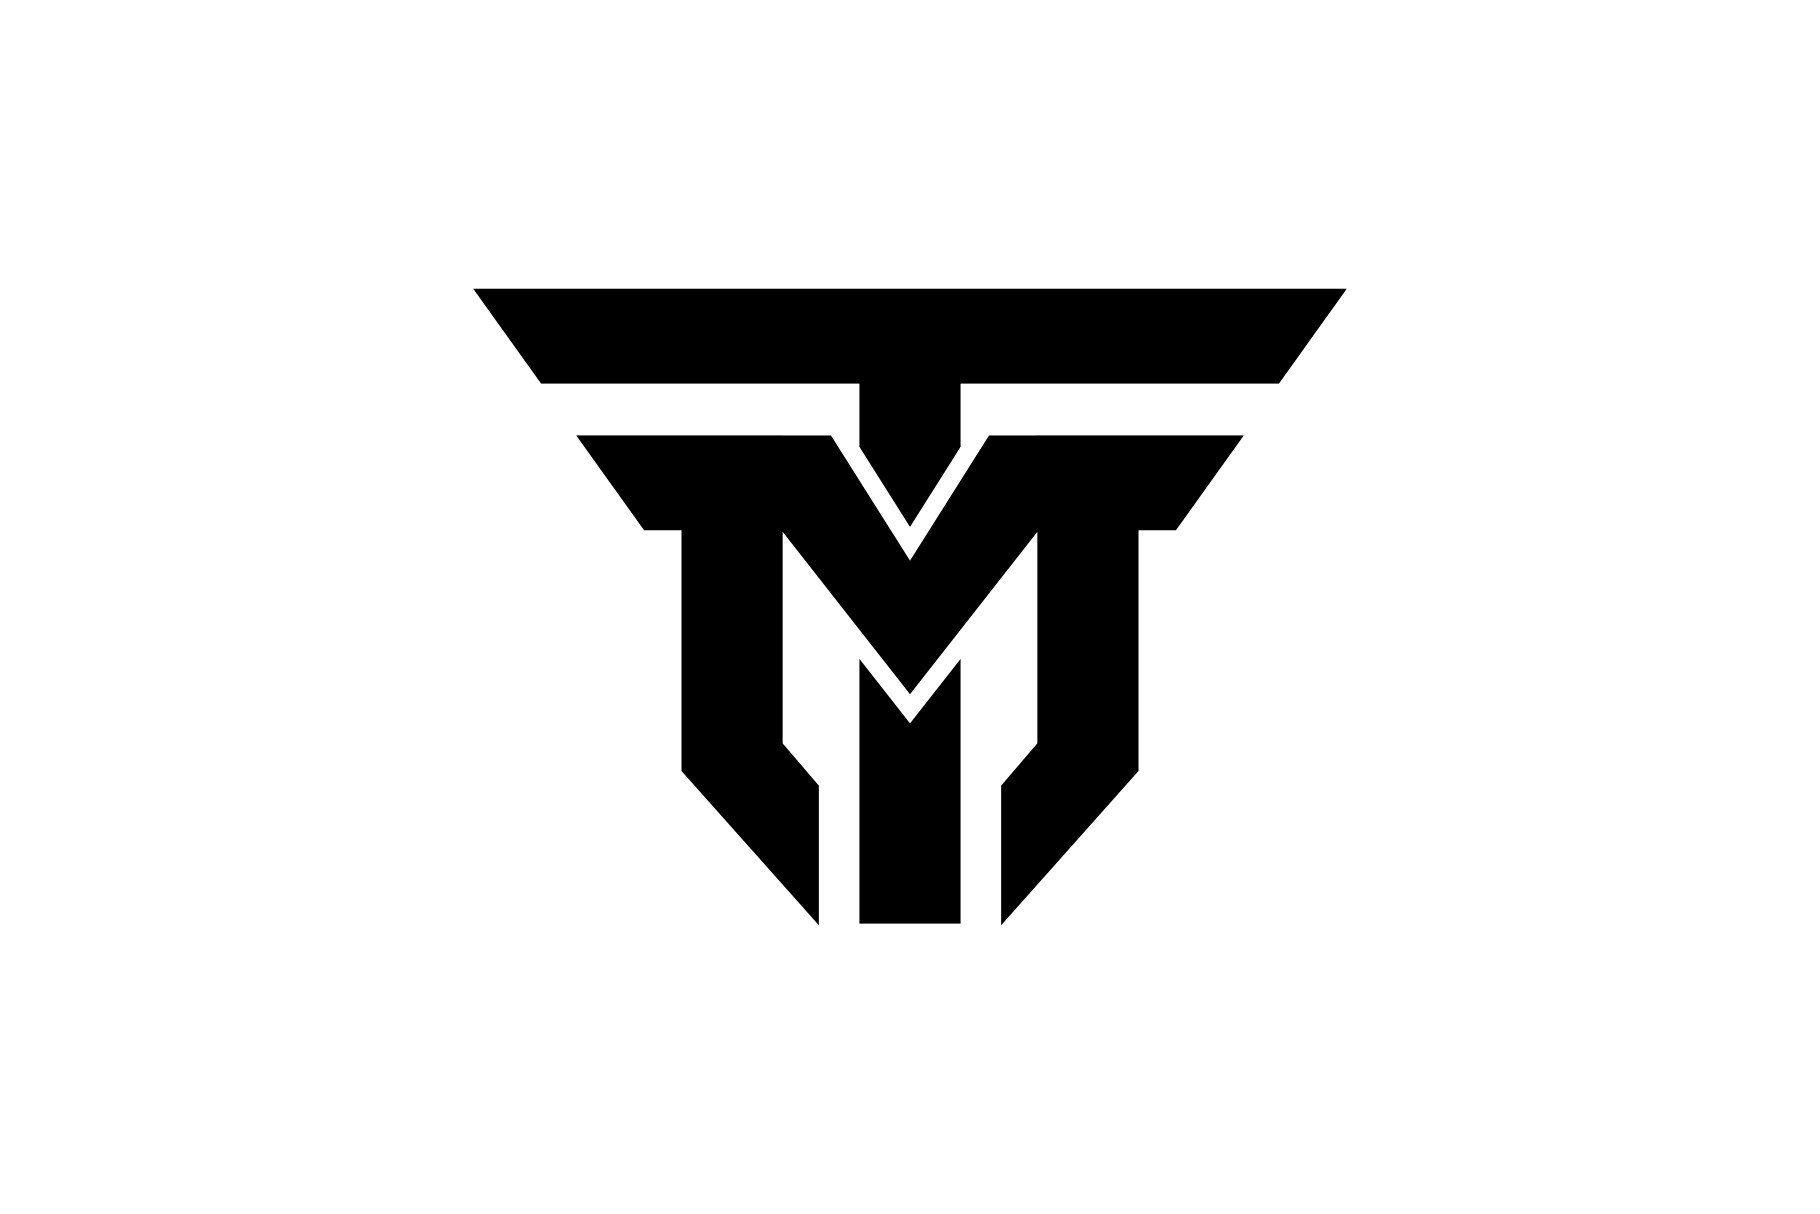 Tm Monogram Logo Monogram Logo Logos Monogram